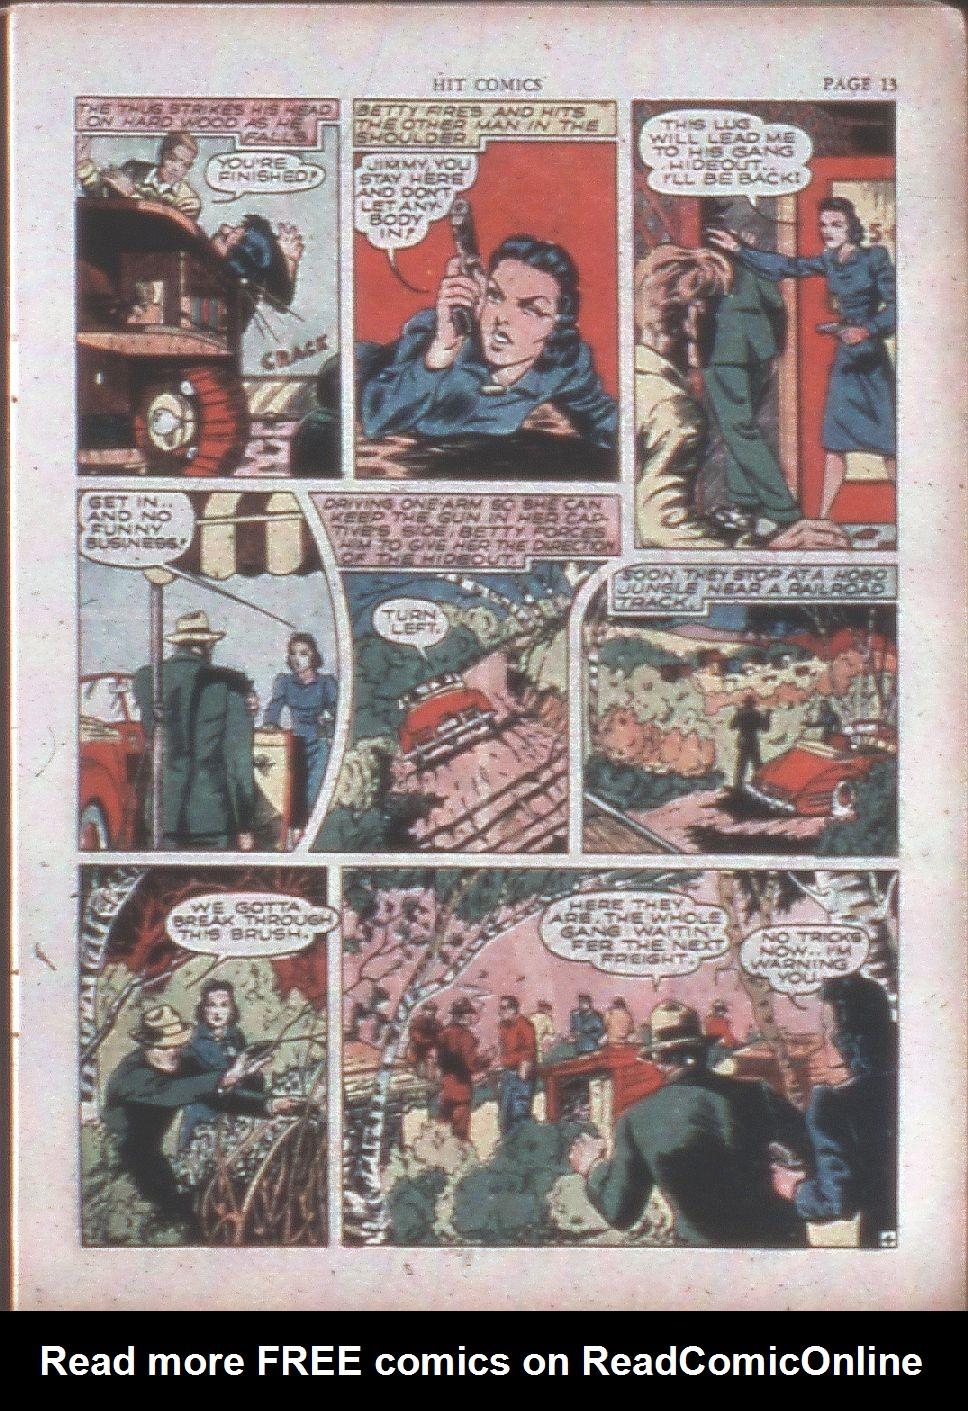 Read online Hit Comics comic -  Issue #15 - 15